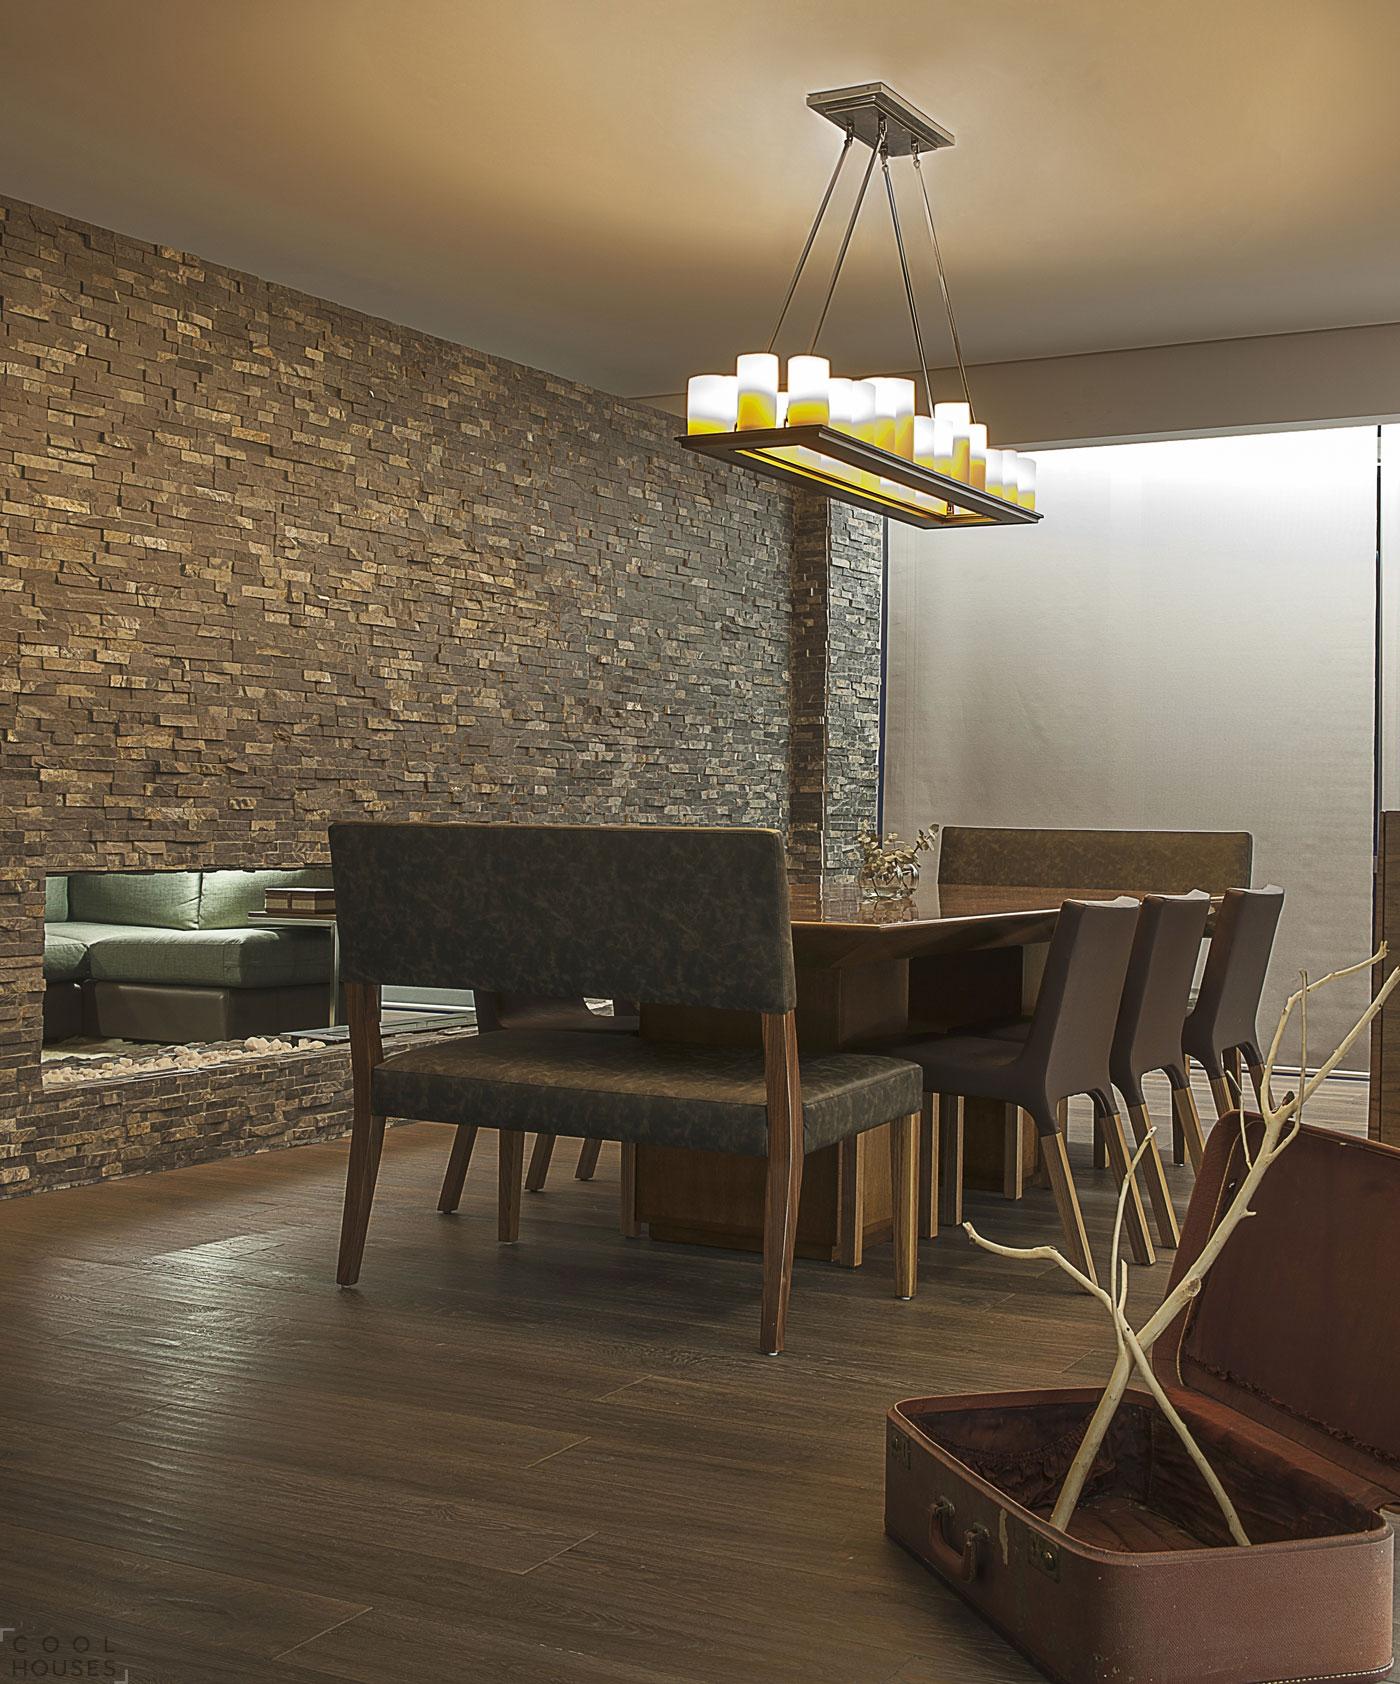 Шикарная квартира DL Apartment в Мехико, Мексика